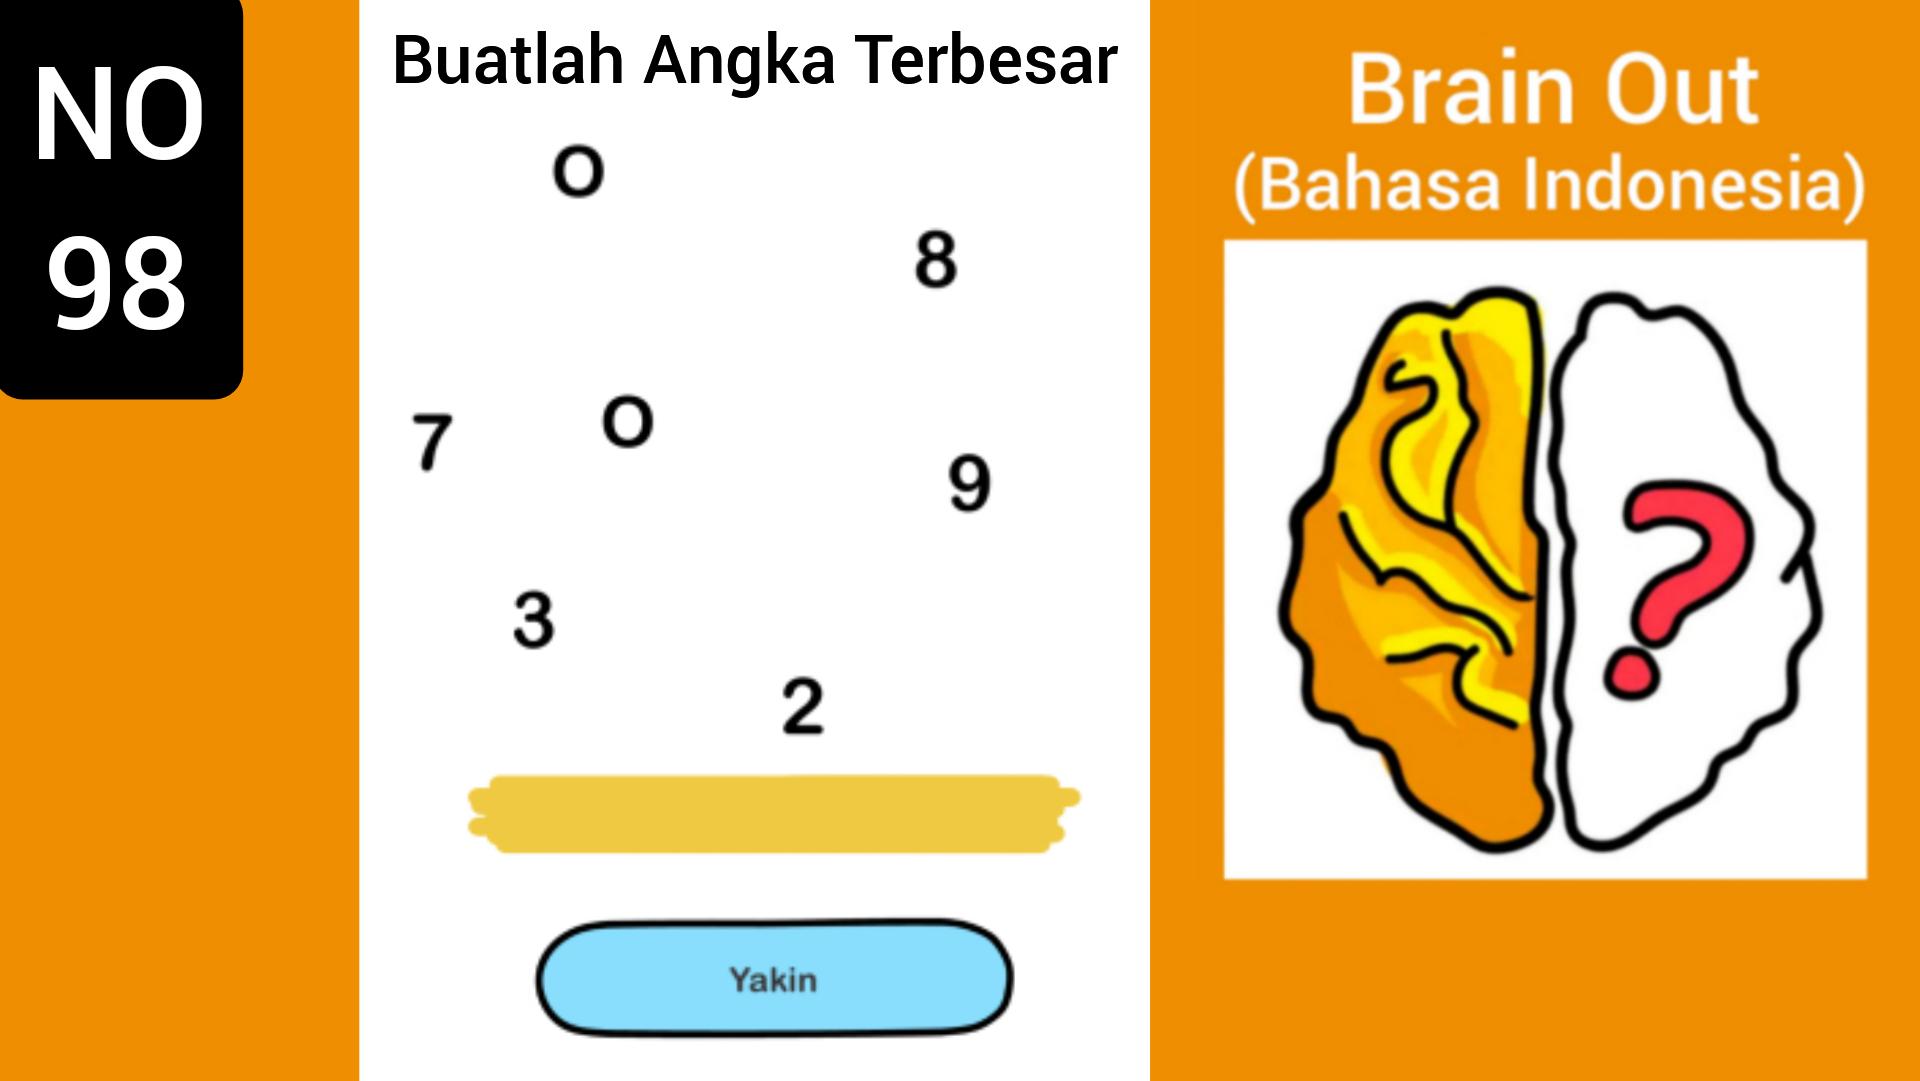 Buatlah angka 5 menjadi 9 dengan cara memindahkan 1 korek dari angka 8 ke angka 5. Kunci Jawaban Brain Out Angka Terbesar - Jawaban Buatlah